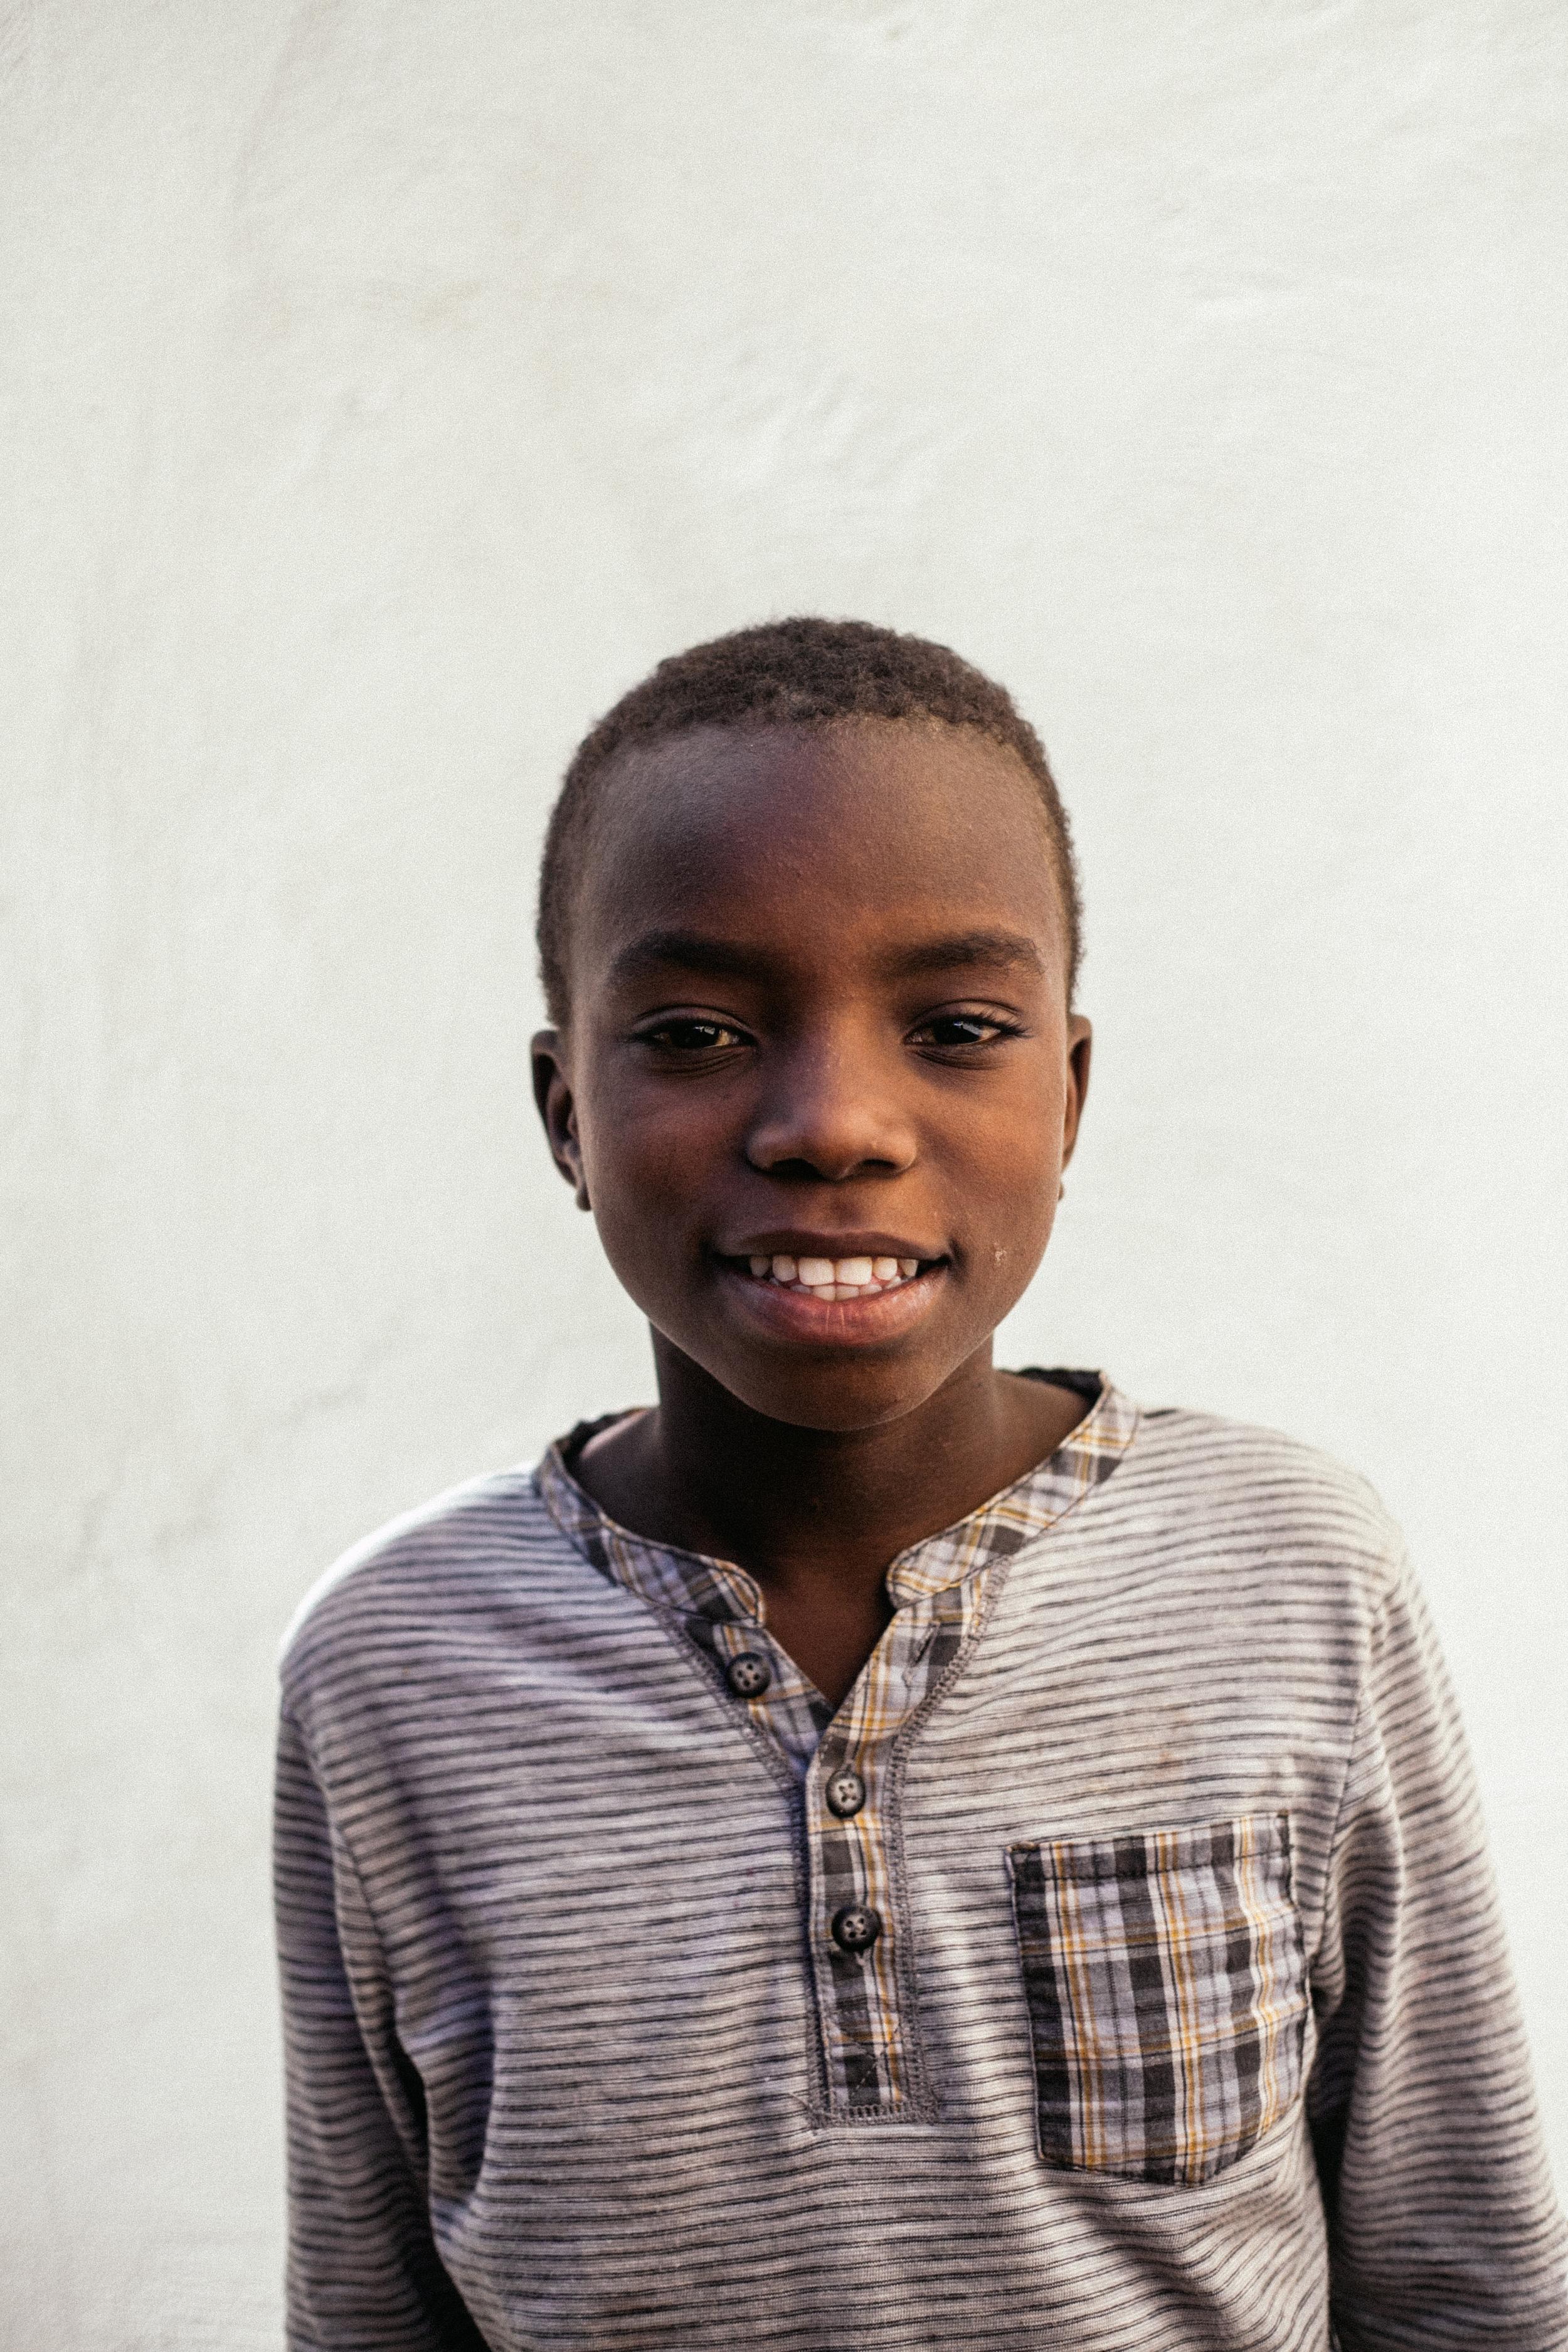 Haiti5starslores146.jpg